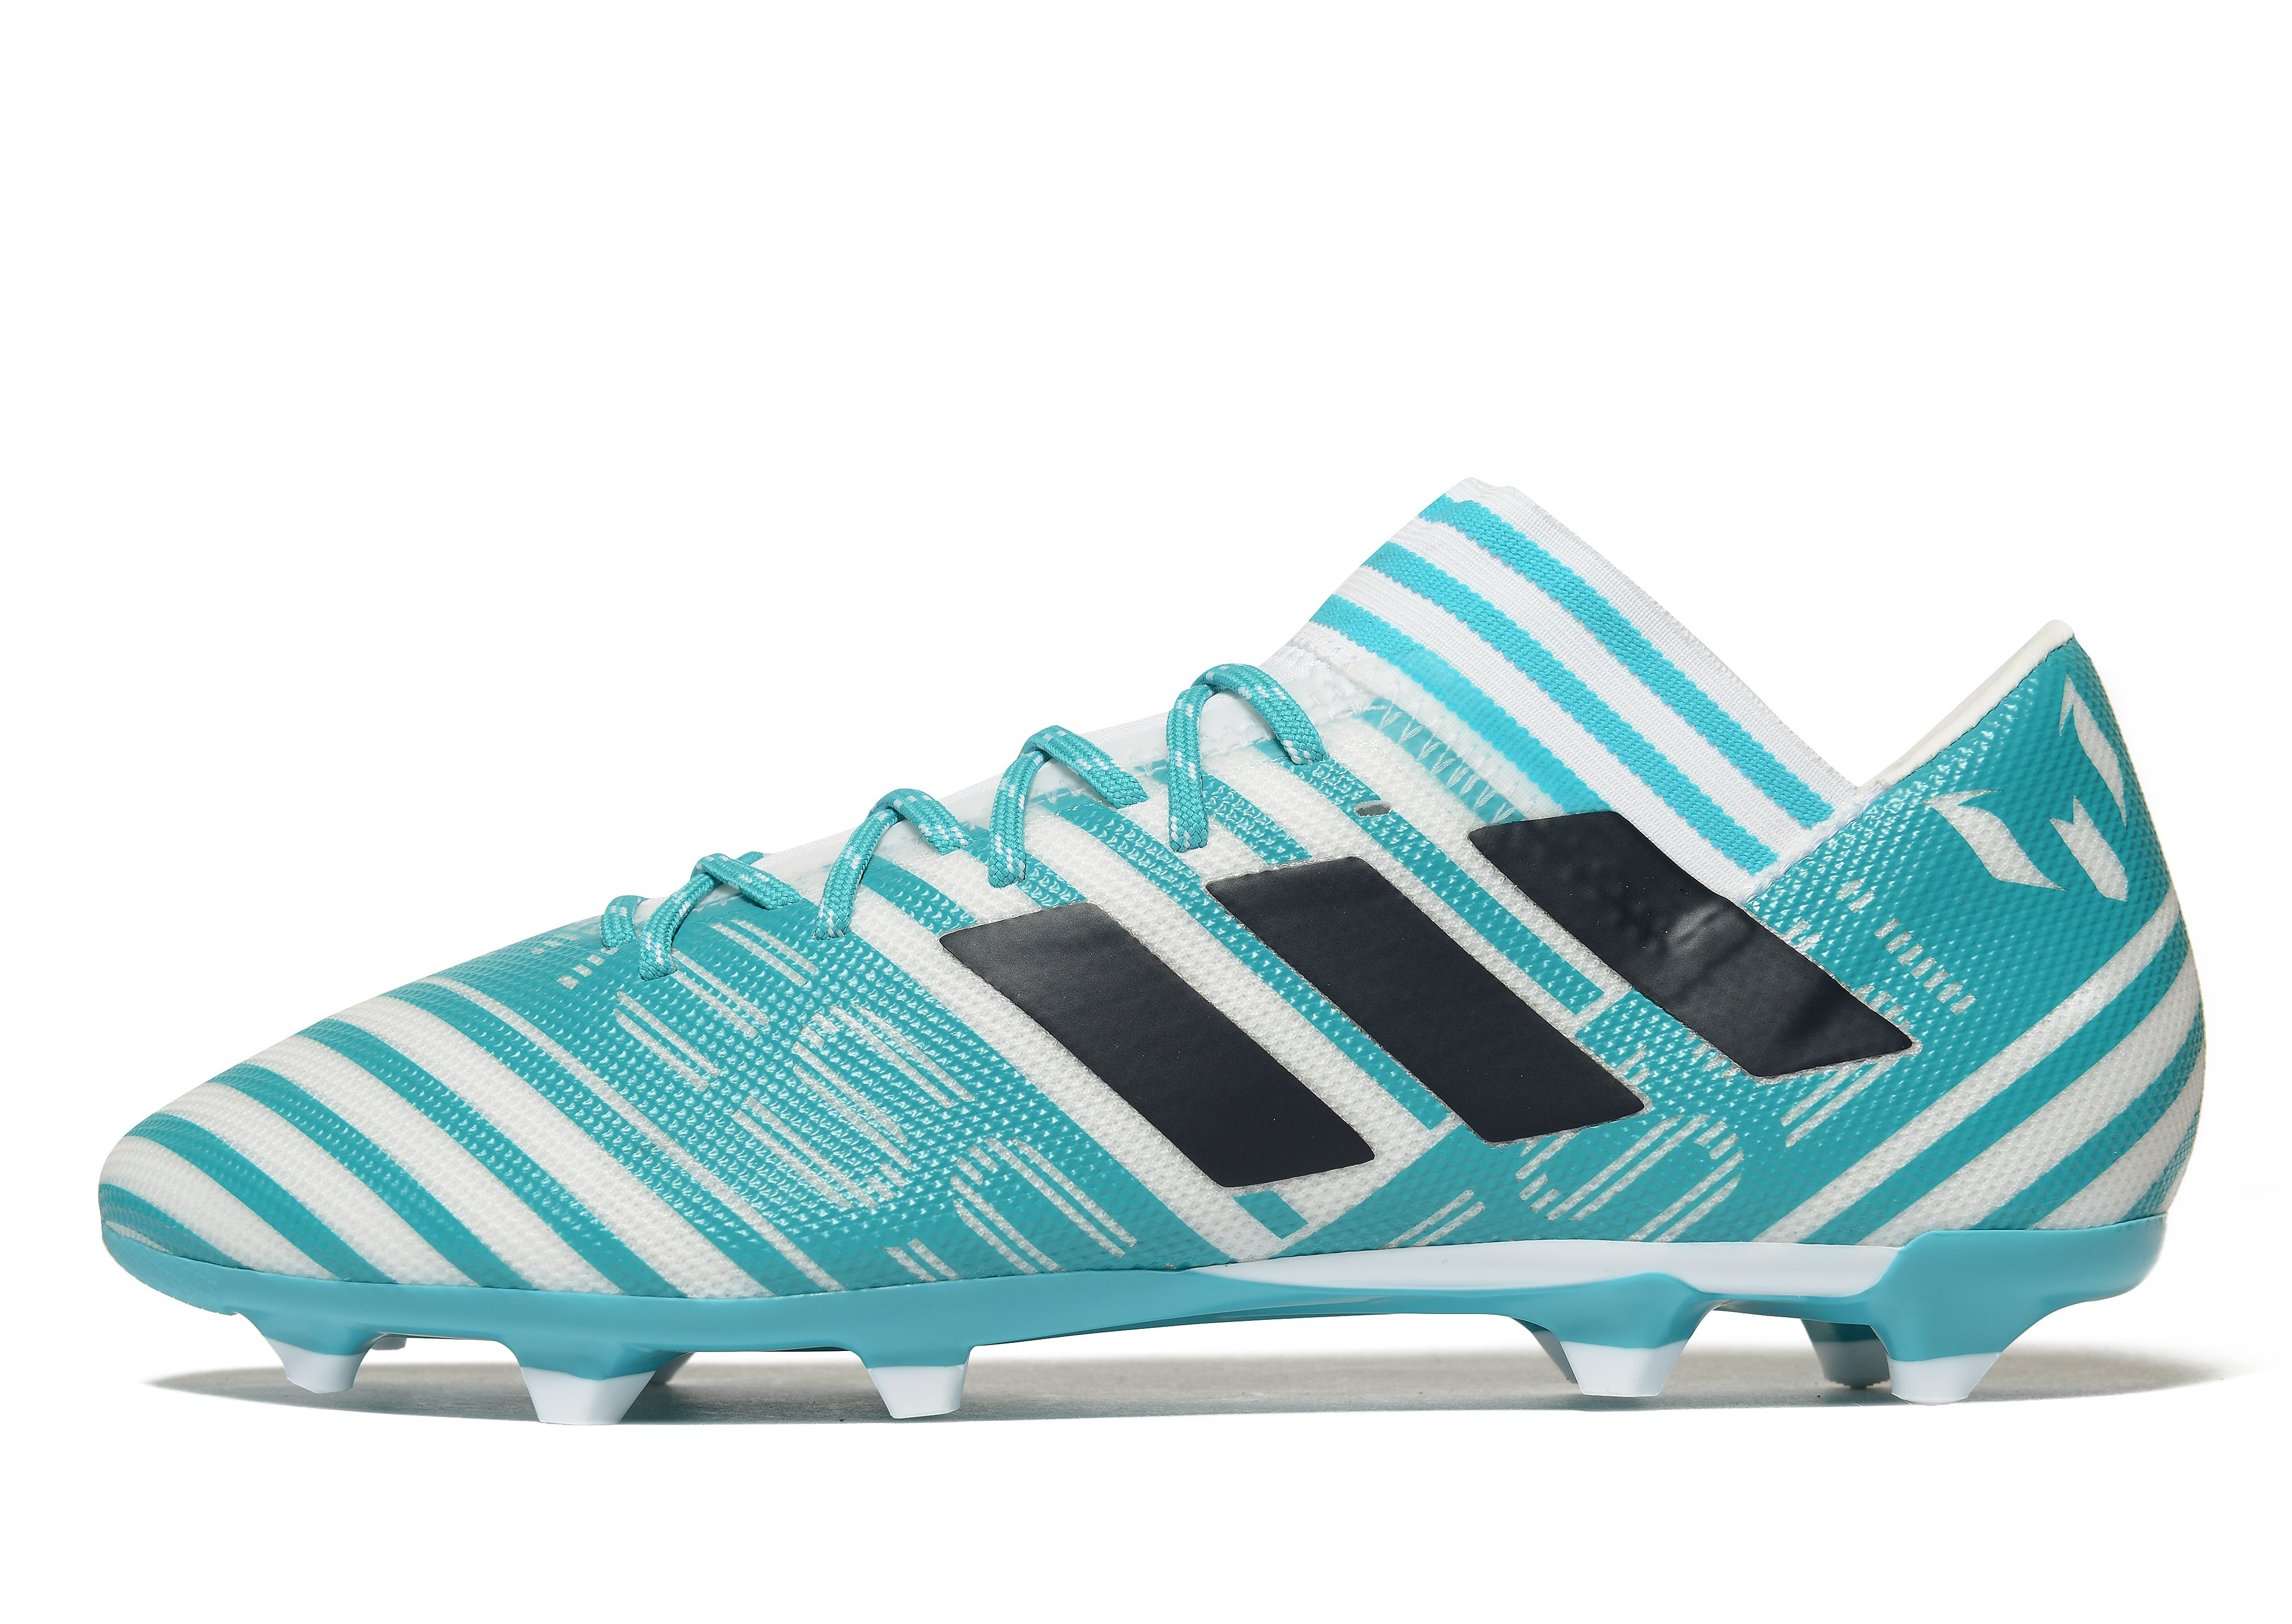 adidas Ocean Storm Nemeziz 17.3 FG Messi